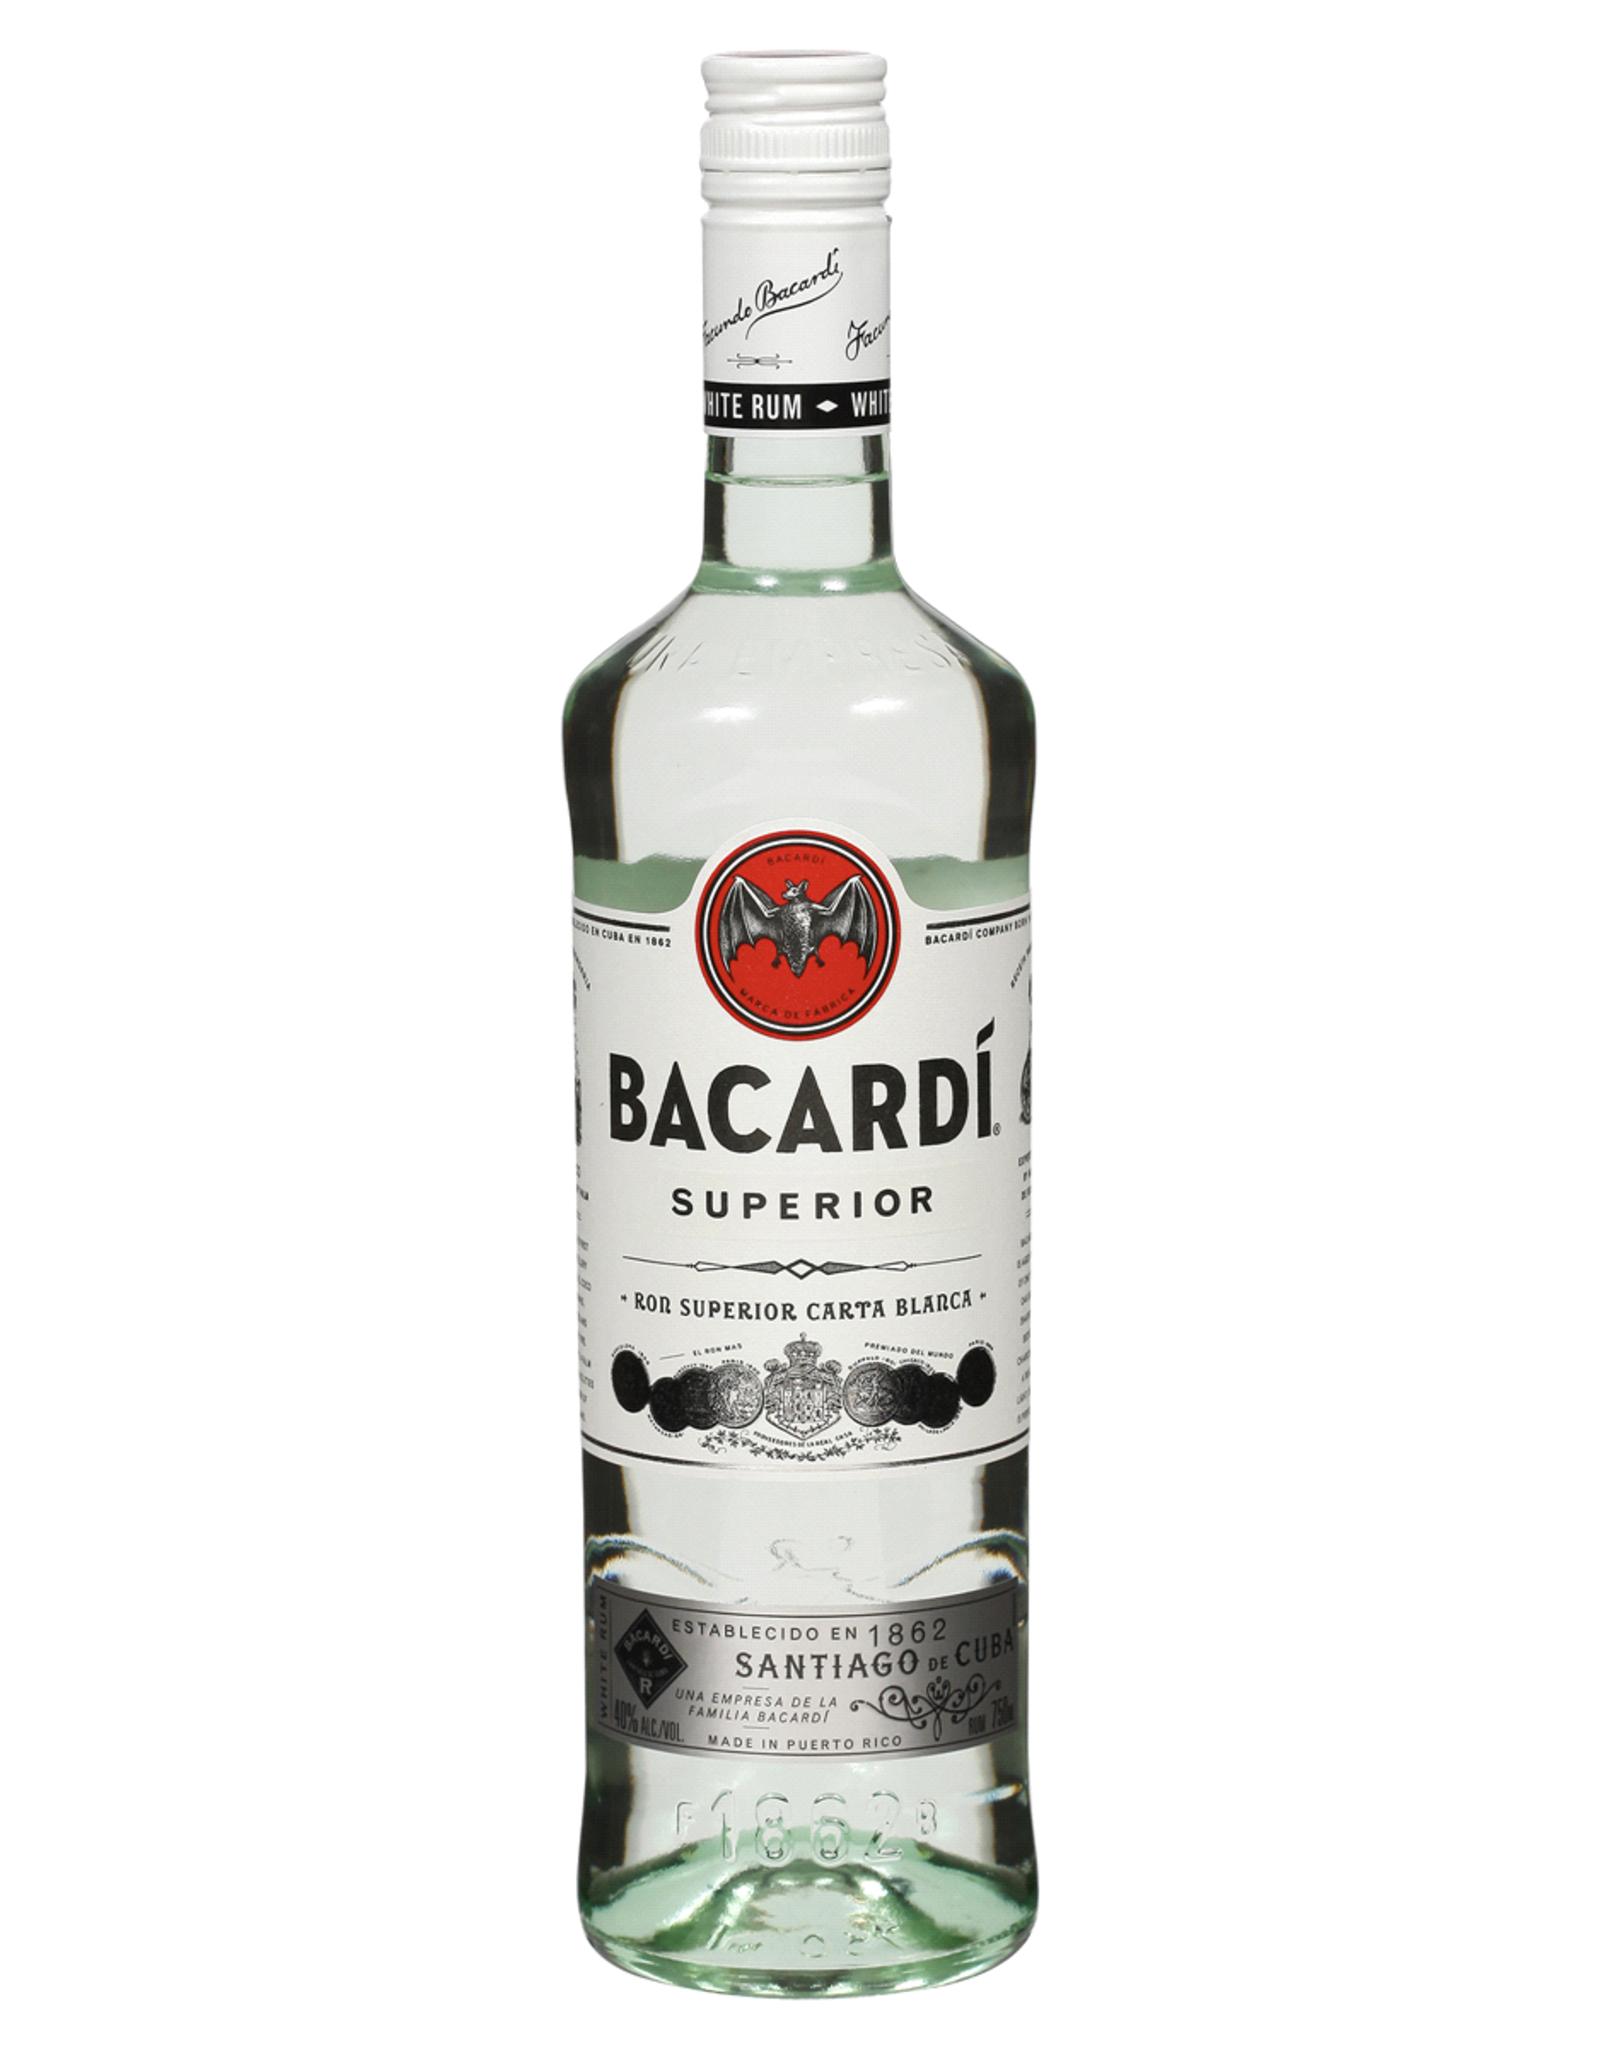 Bacardi Bacardi Rum Superior 750ML